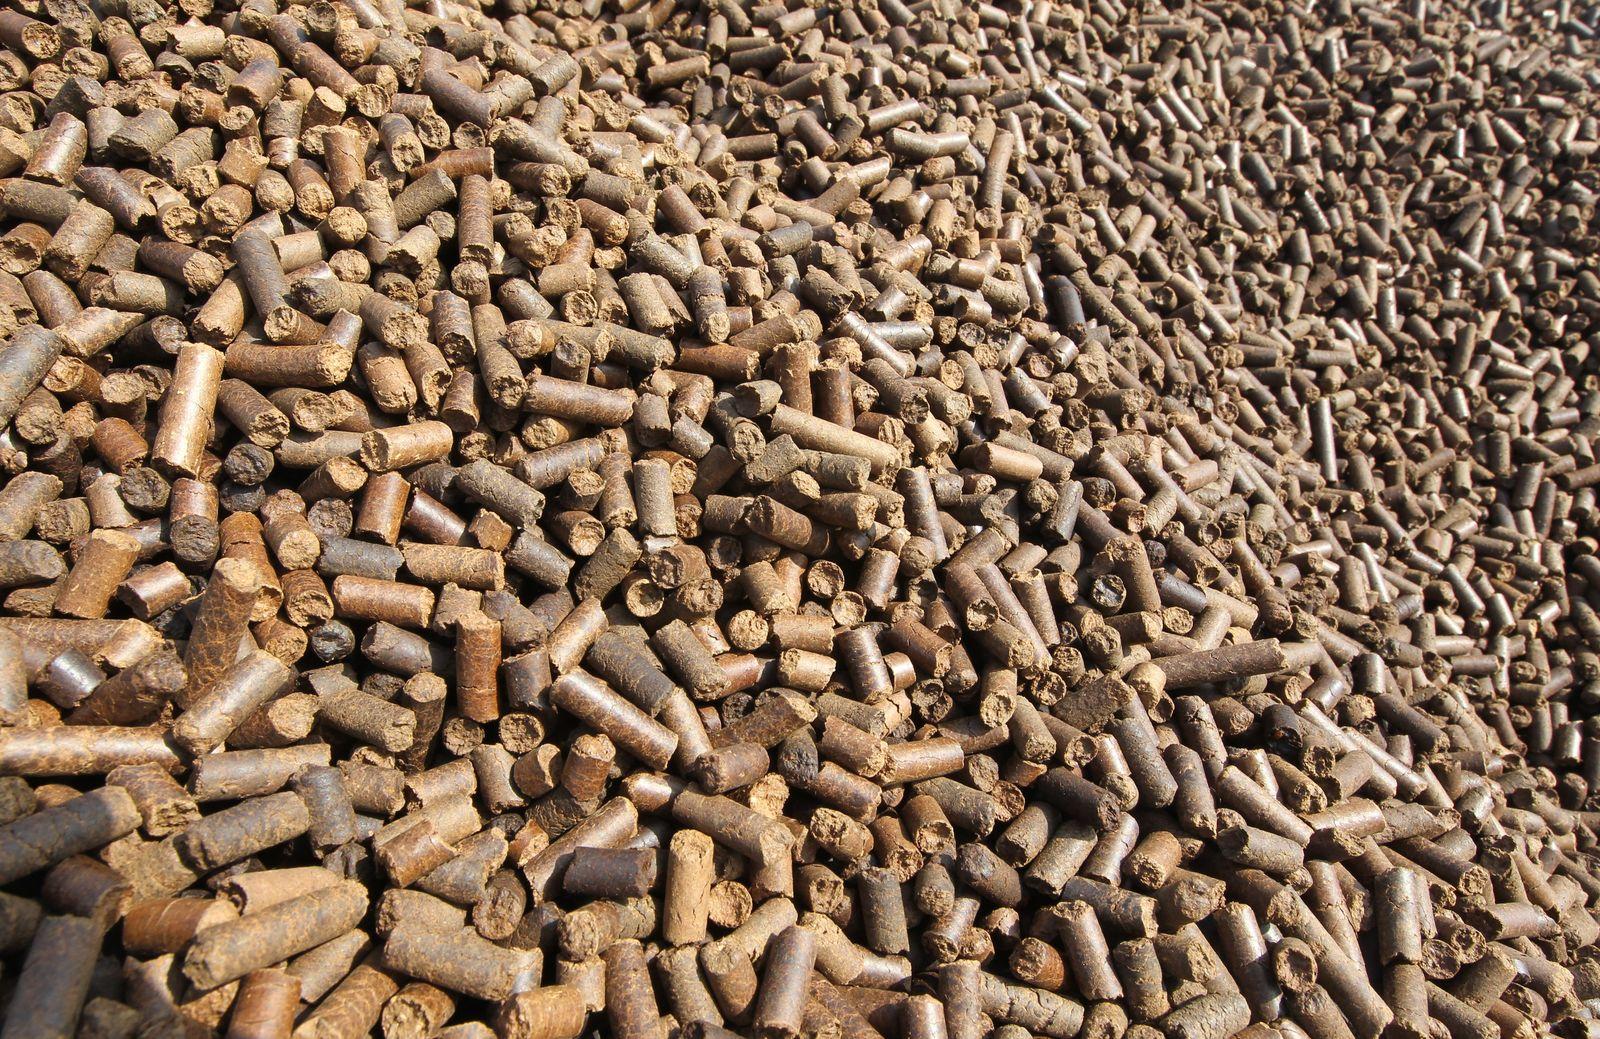 Holz statt Kohle - Energiekonzern startet Piloprojekt